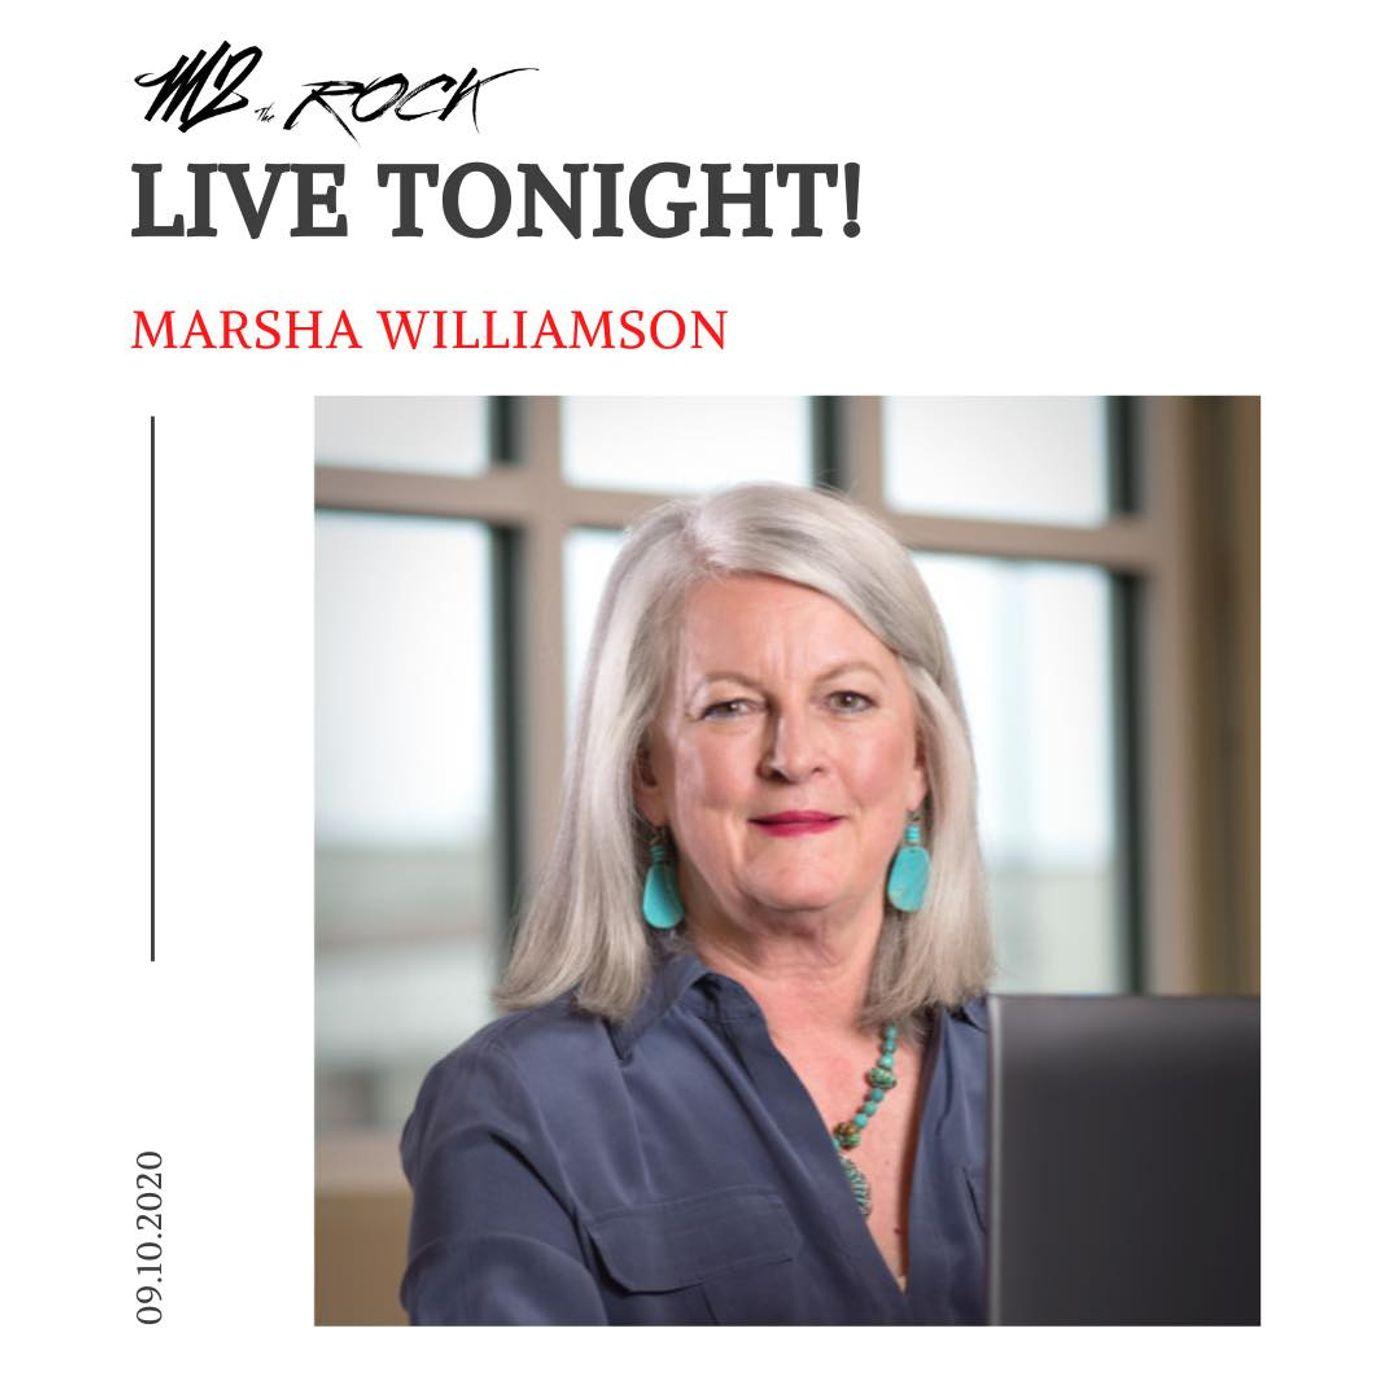 Marsha Williamson LIVE on M2 the Rock